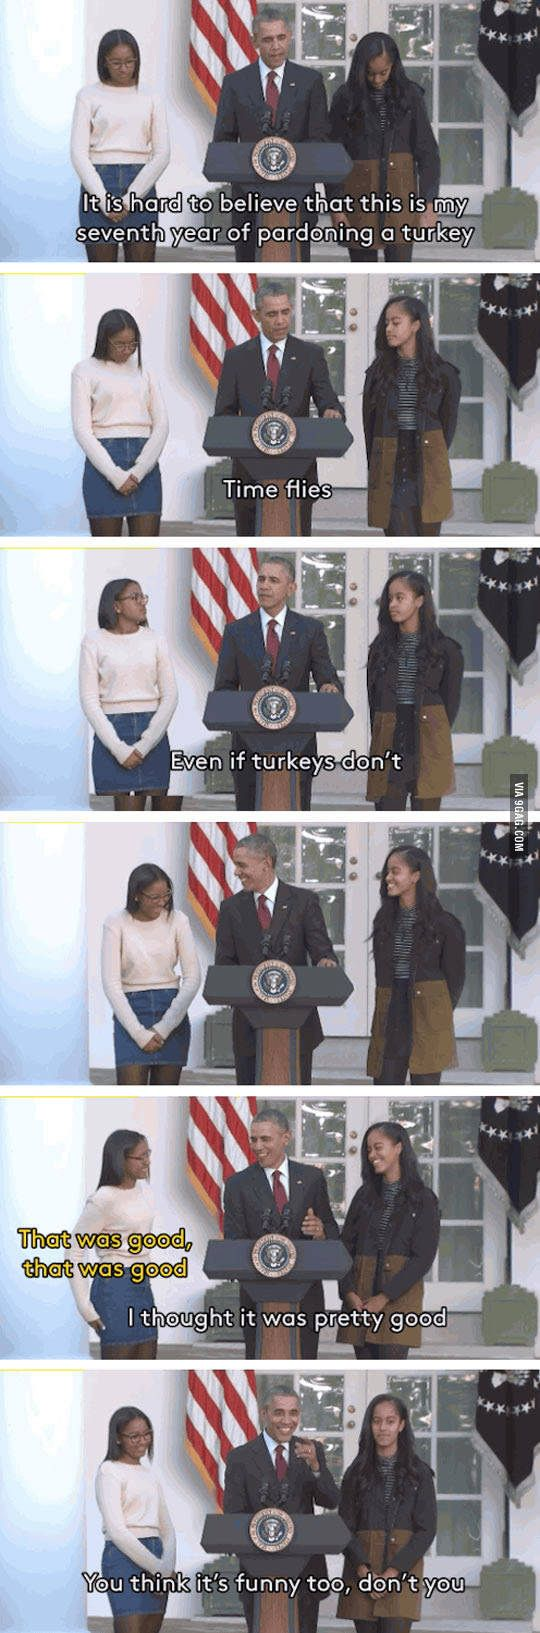 Obama's the best  dad jokes lol